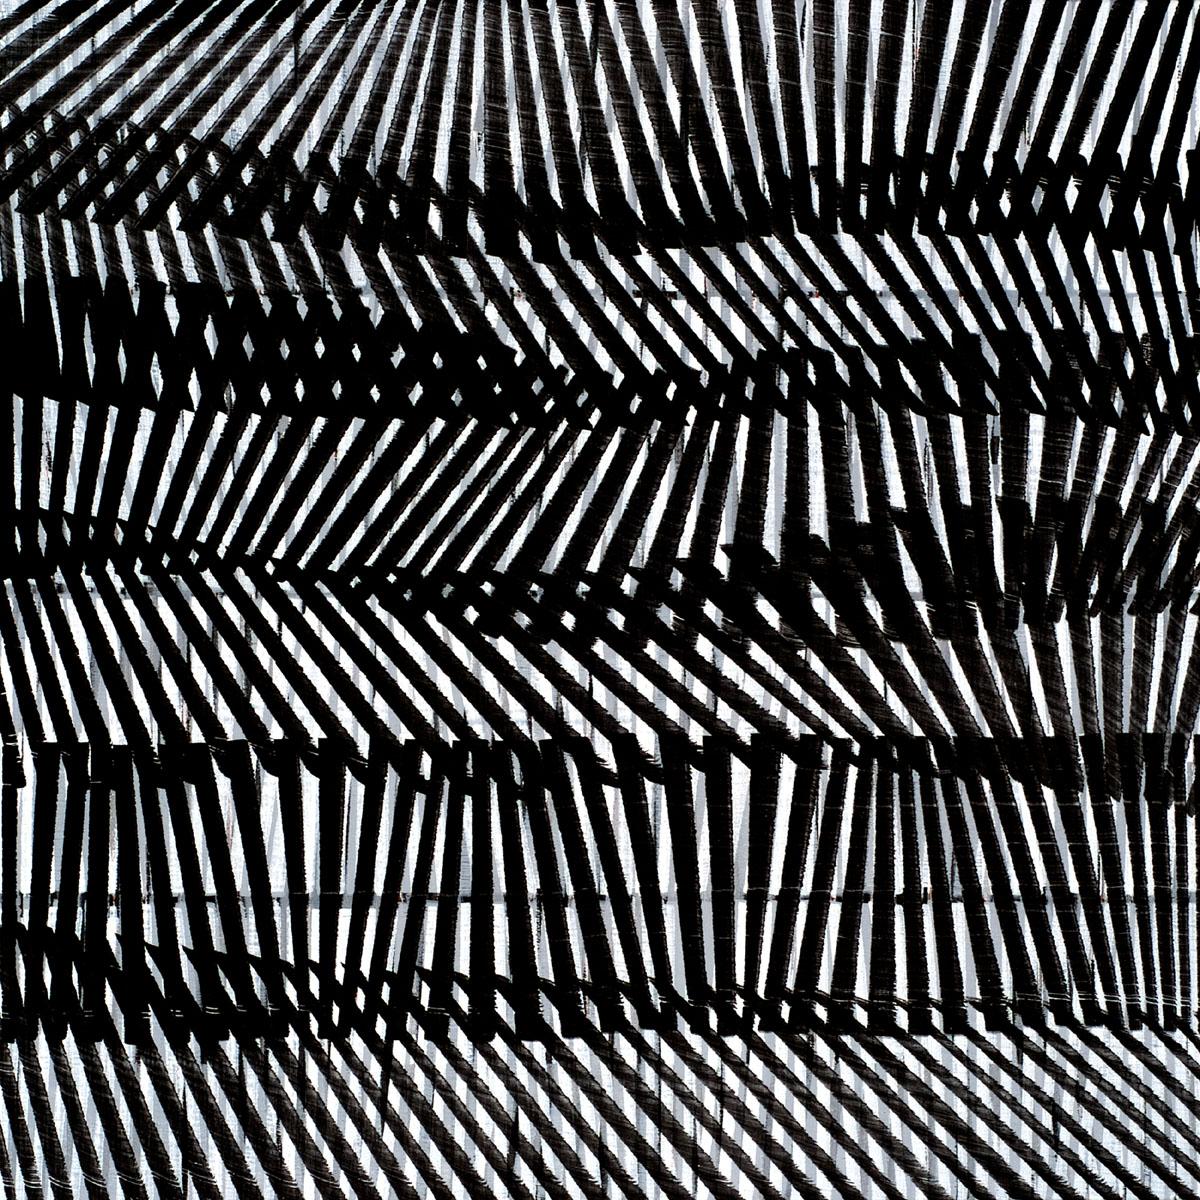 Nikola Dimitrov, KlangStück V 2016, Pigmente, Bindemittel auf Leinwand, 80 × 80 cm